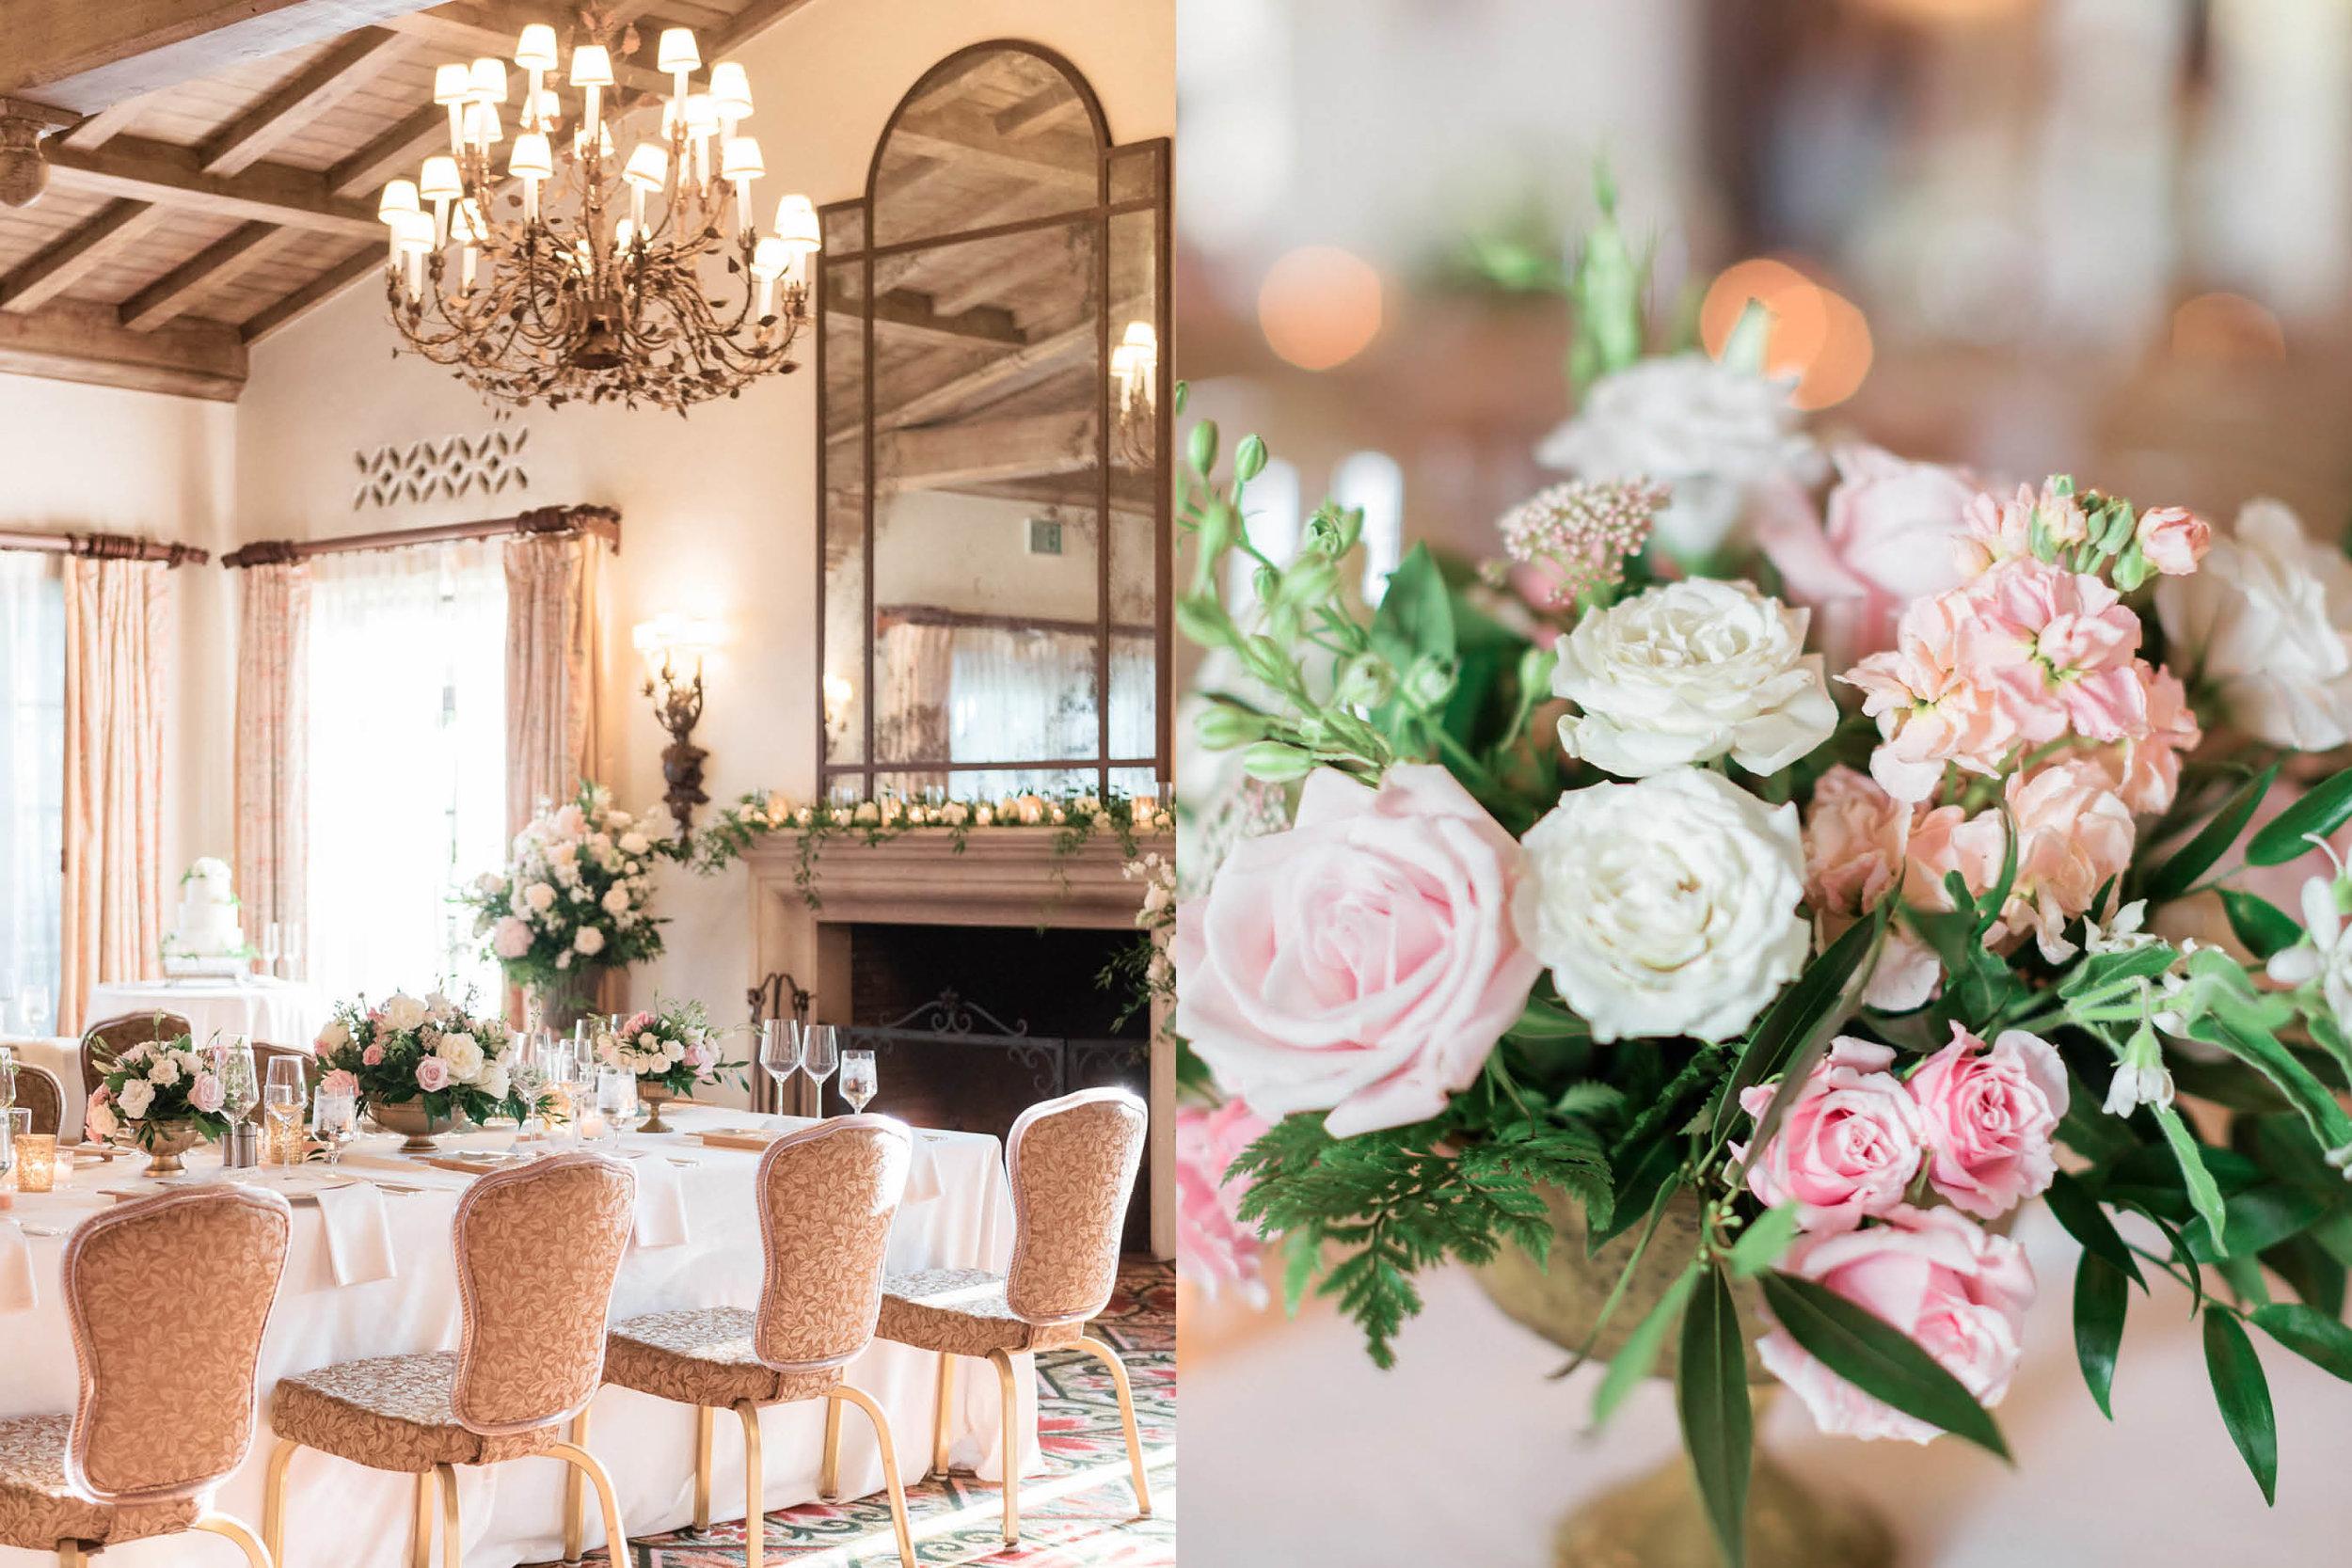 santa-barbara-elopement-elope-wedding-planner-coordinator-day-of-four-seasons-biltmore-ocean-front-view-garden-pink-white-green-montecito-black-tie (20).jpg